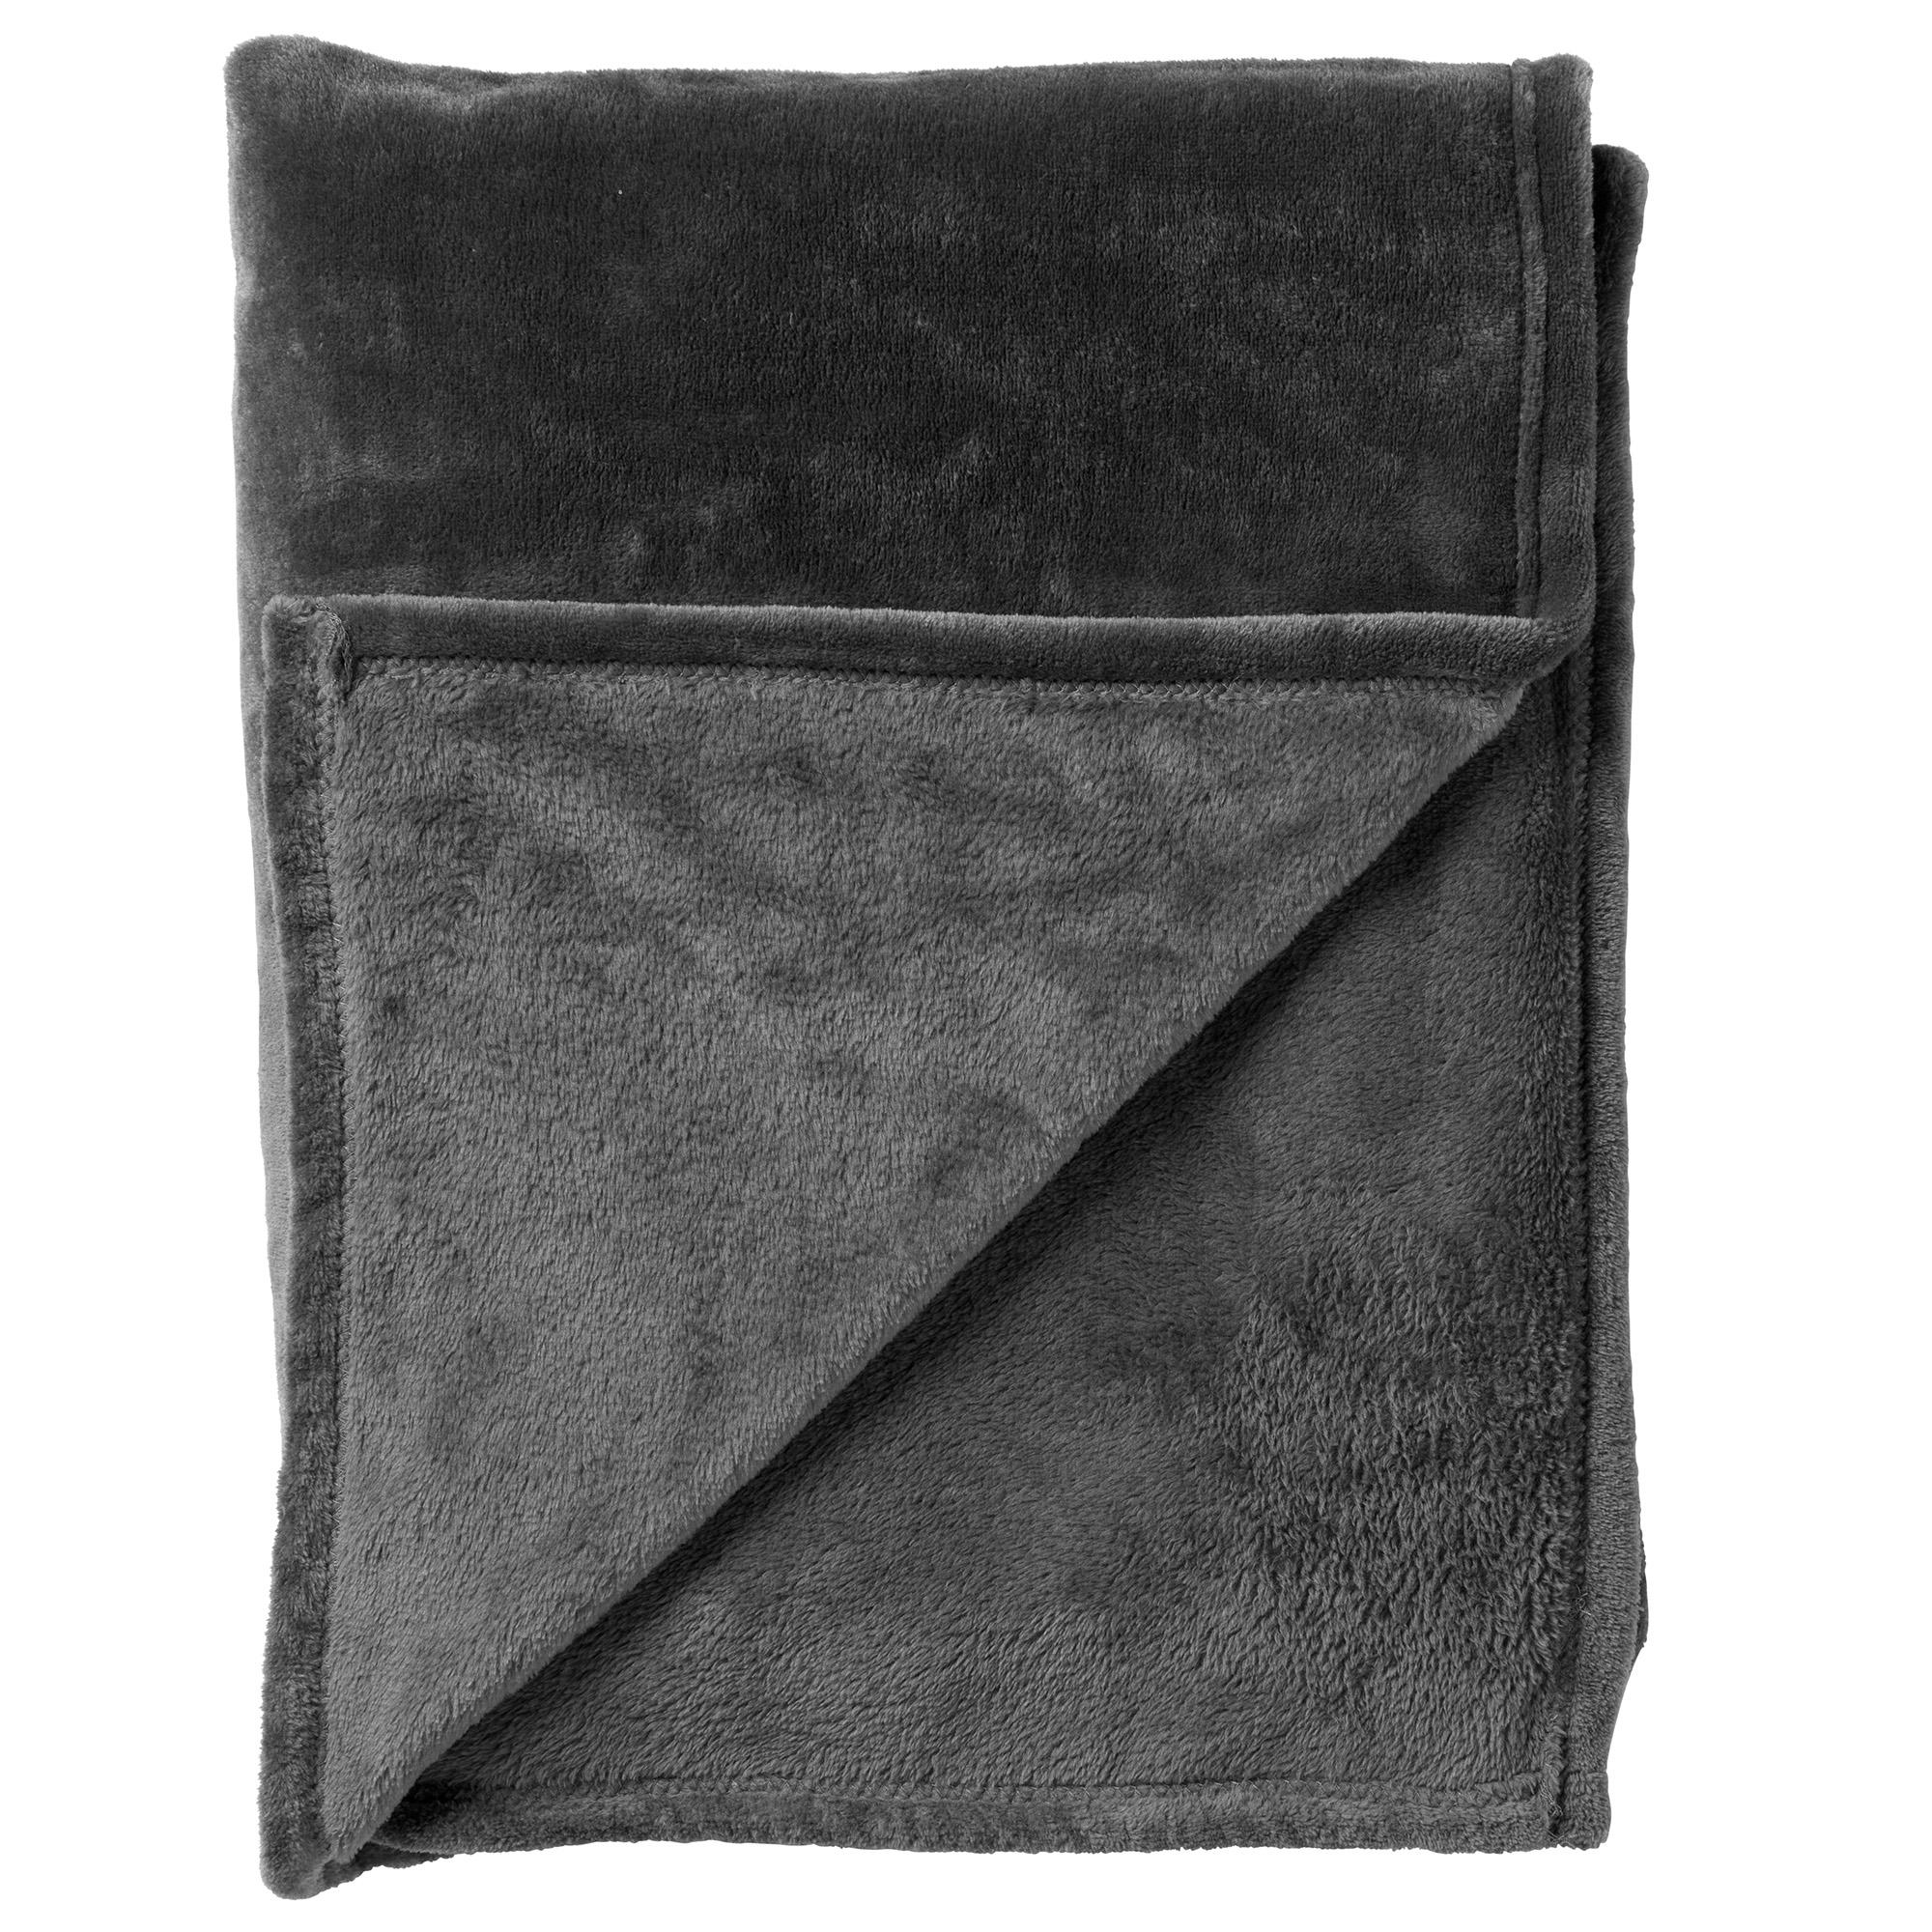 BILLY - Plaid Charcoal Grey 150x200 cm